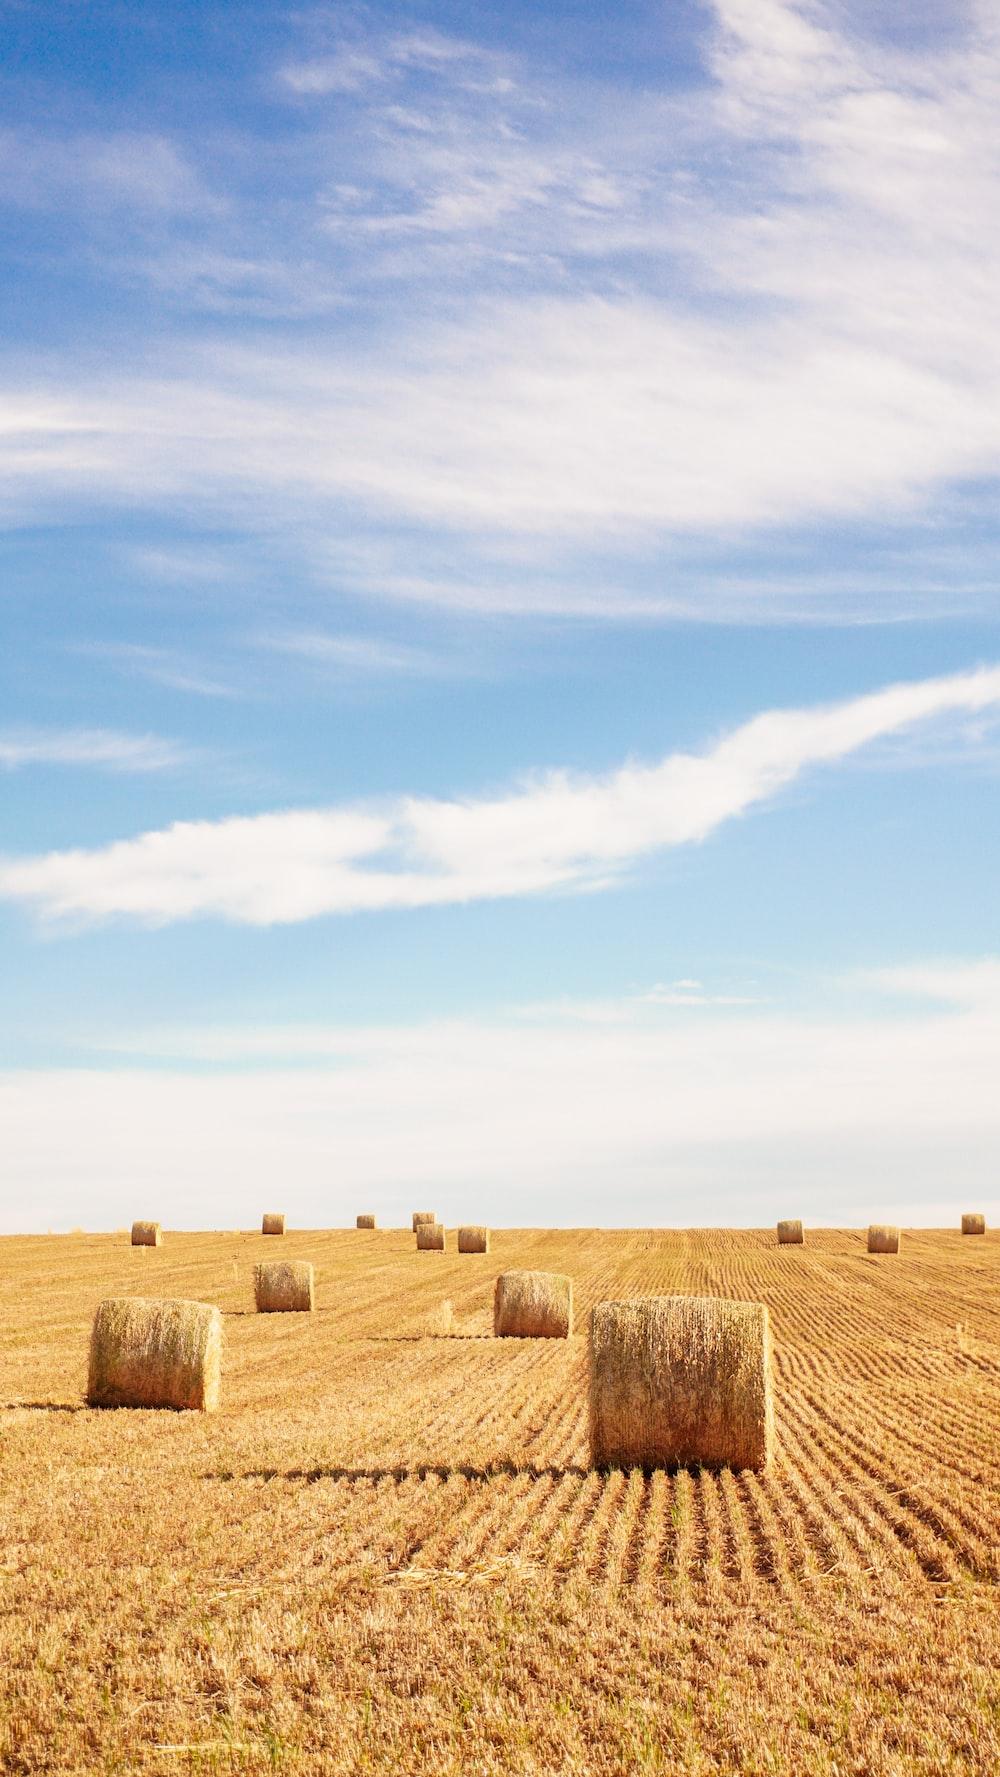 brown hays under blue sky during daytime